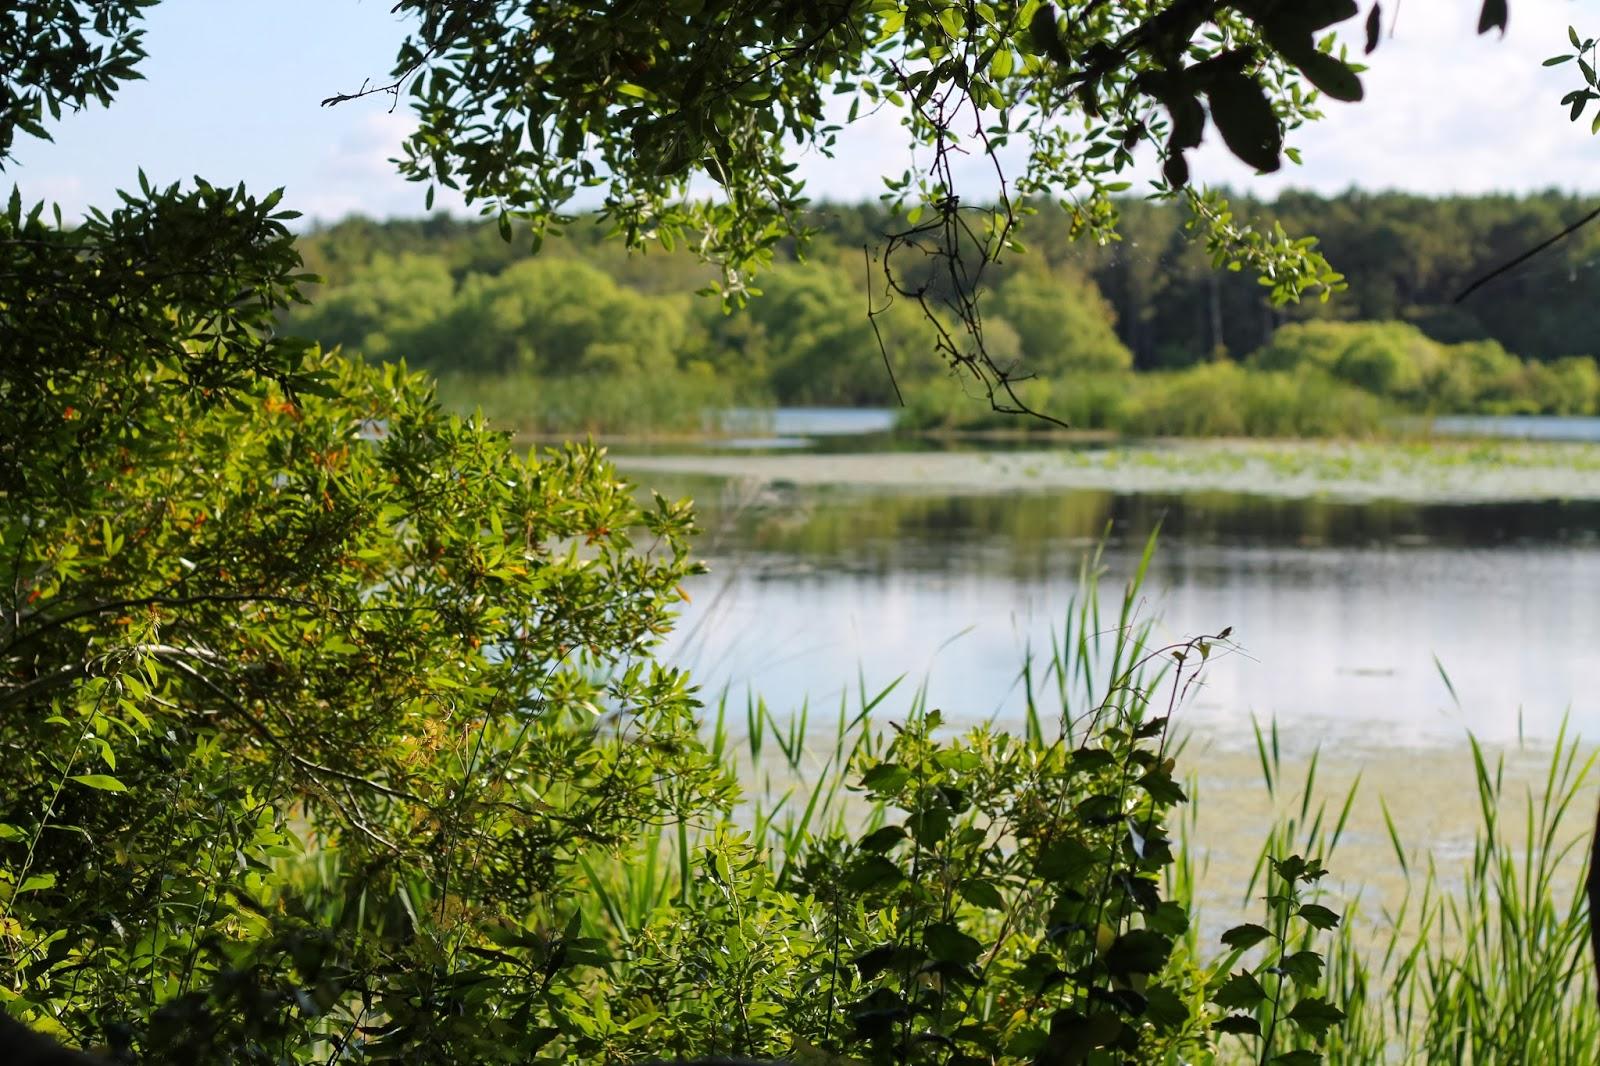 mitcheci photos: South Carolina Gator Country: Swampy lands